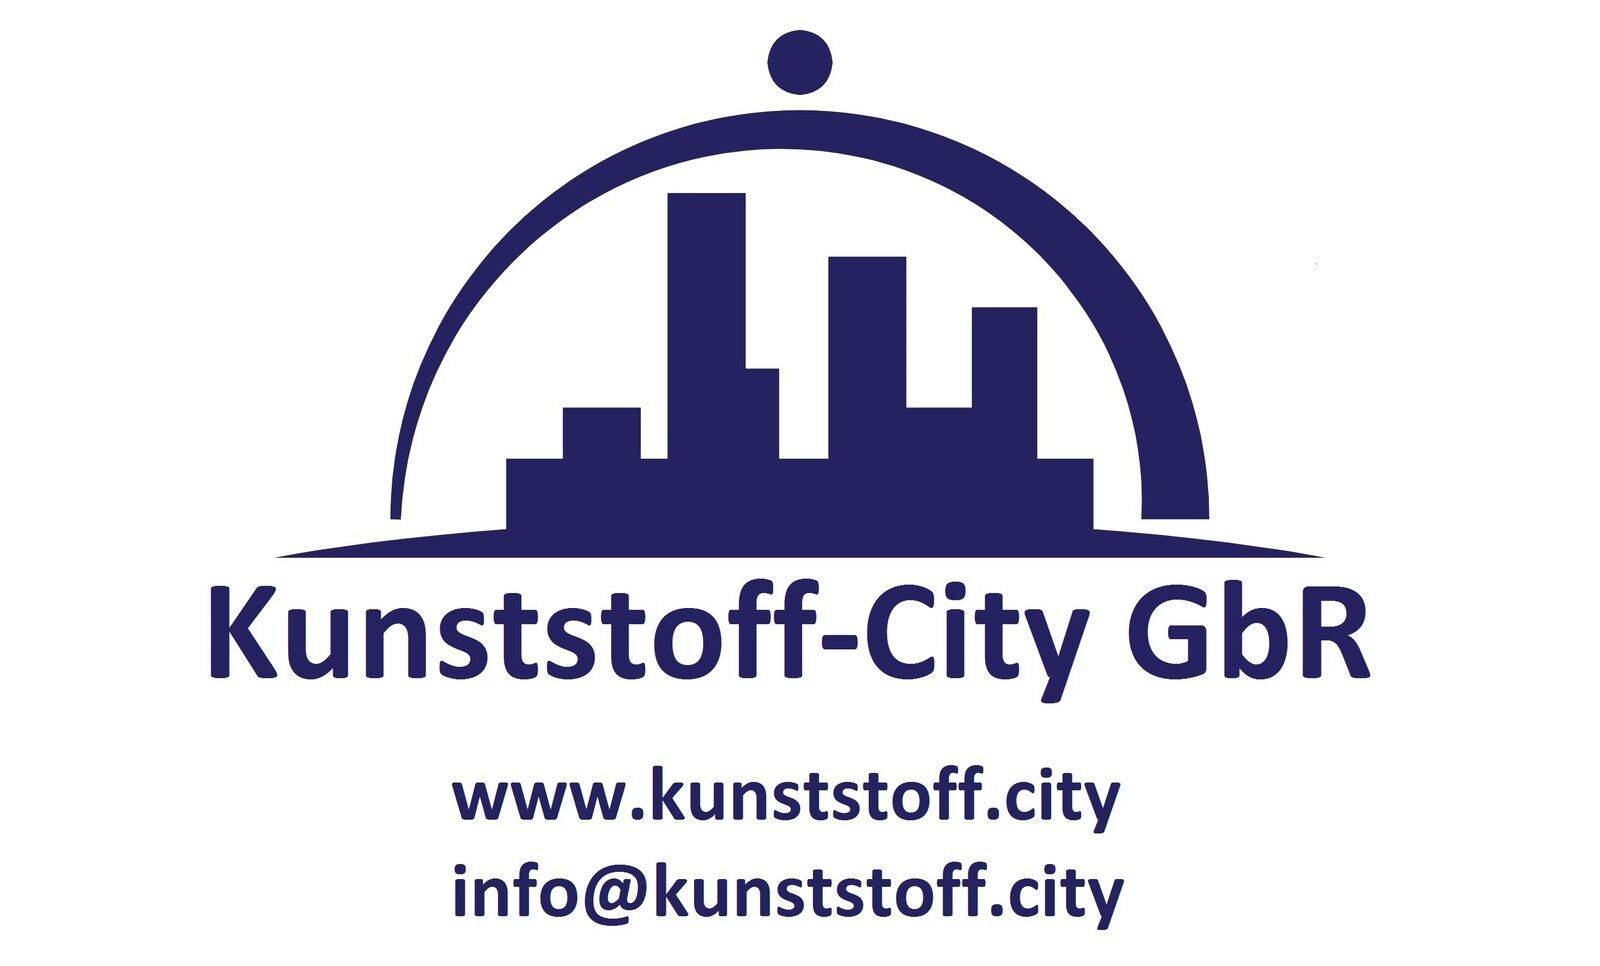 Kunststoff-City